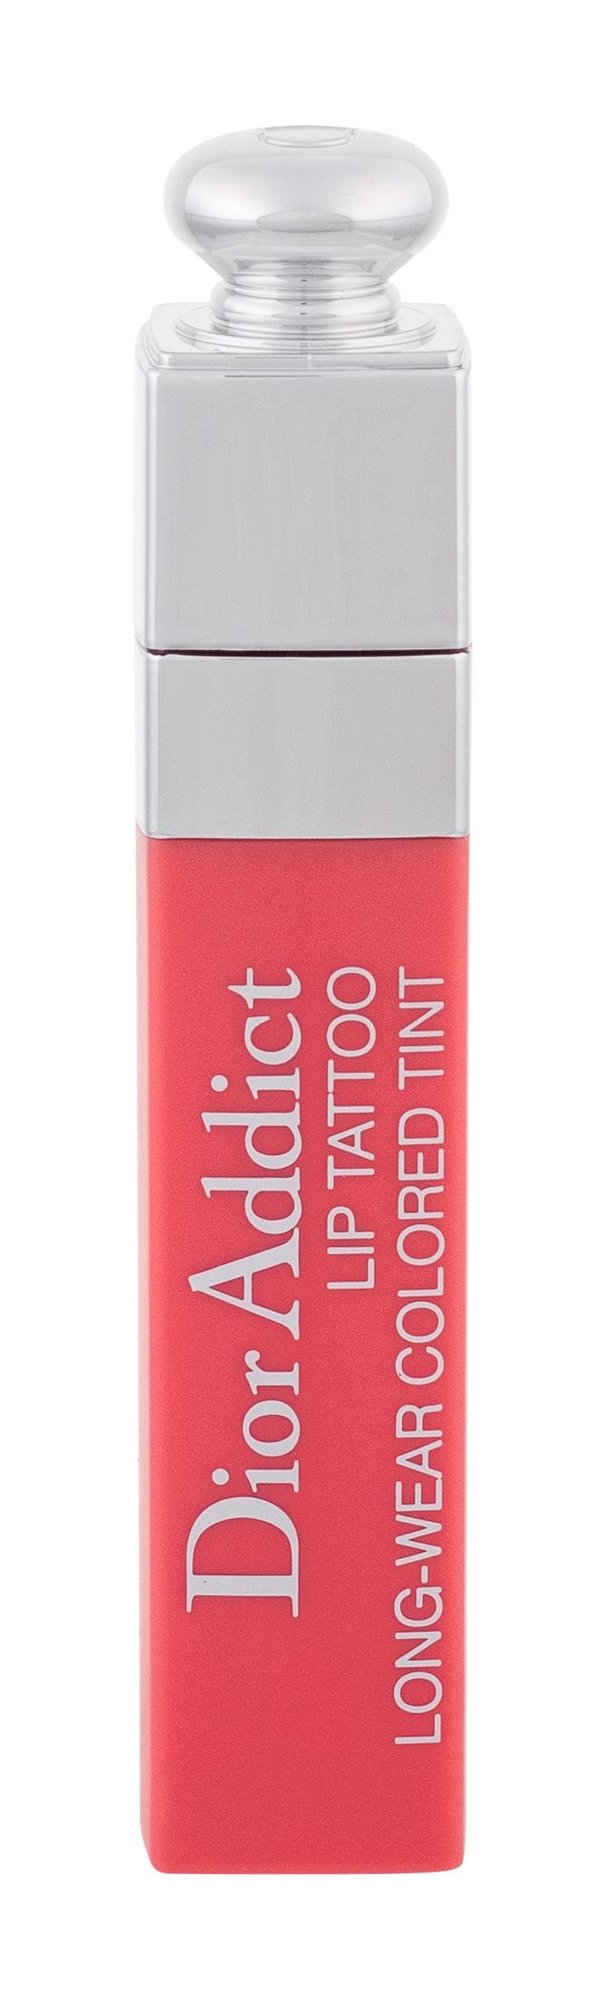 Christian Dior Dior Addict Lipstick 6ml 251 Natural Peach